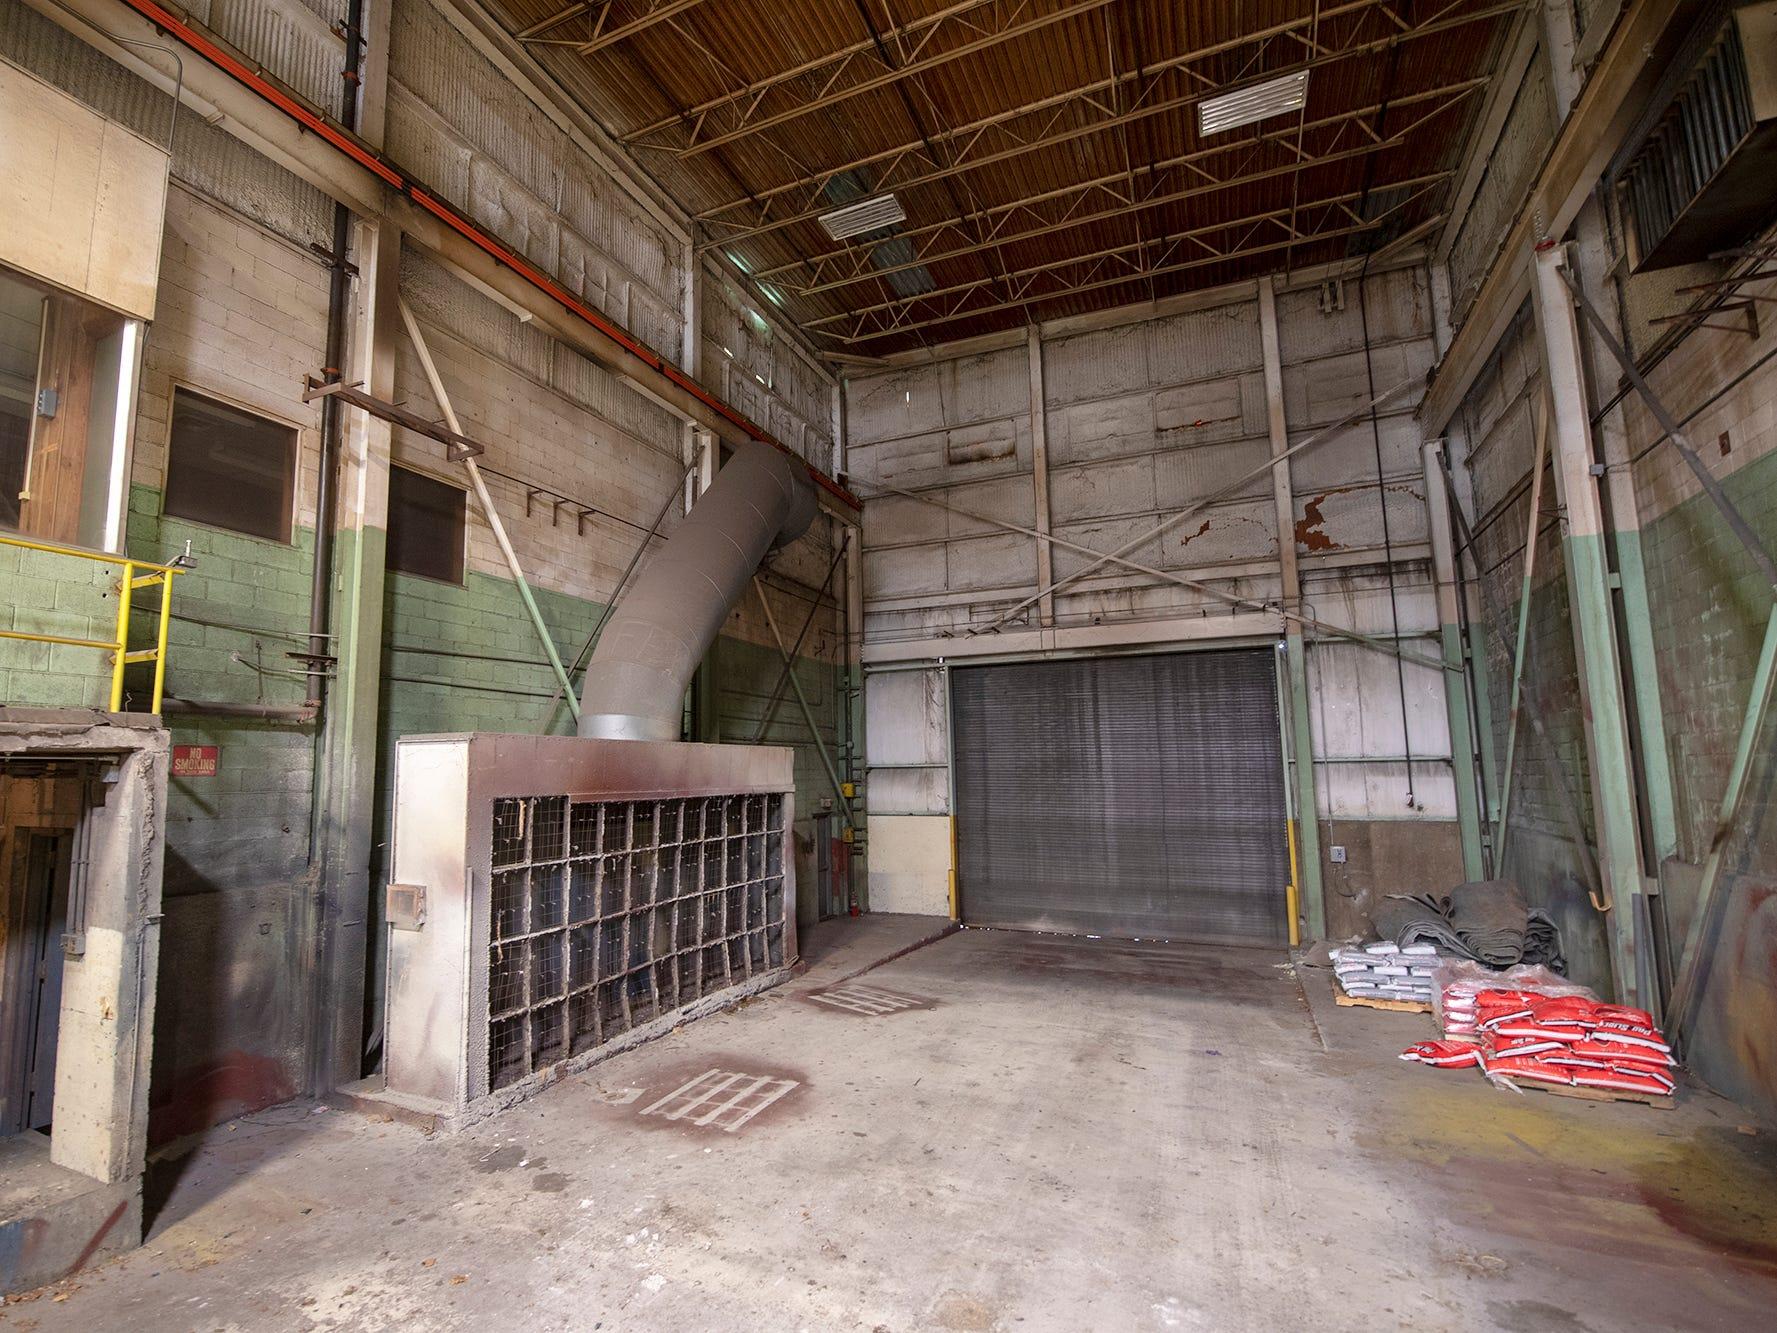 A garage door that faces North Queen Street and stadium parking lot.